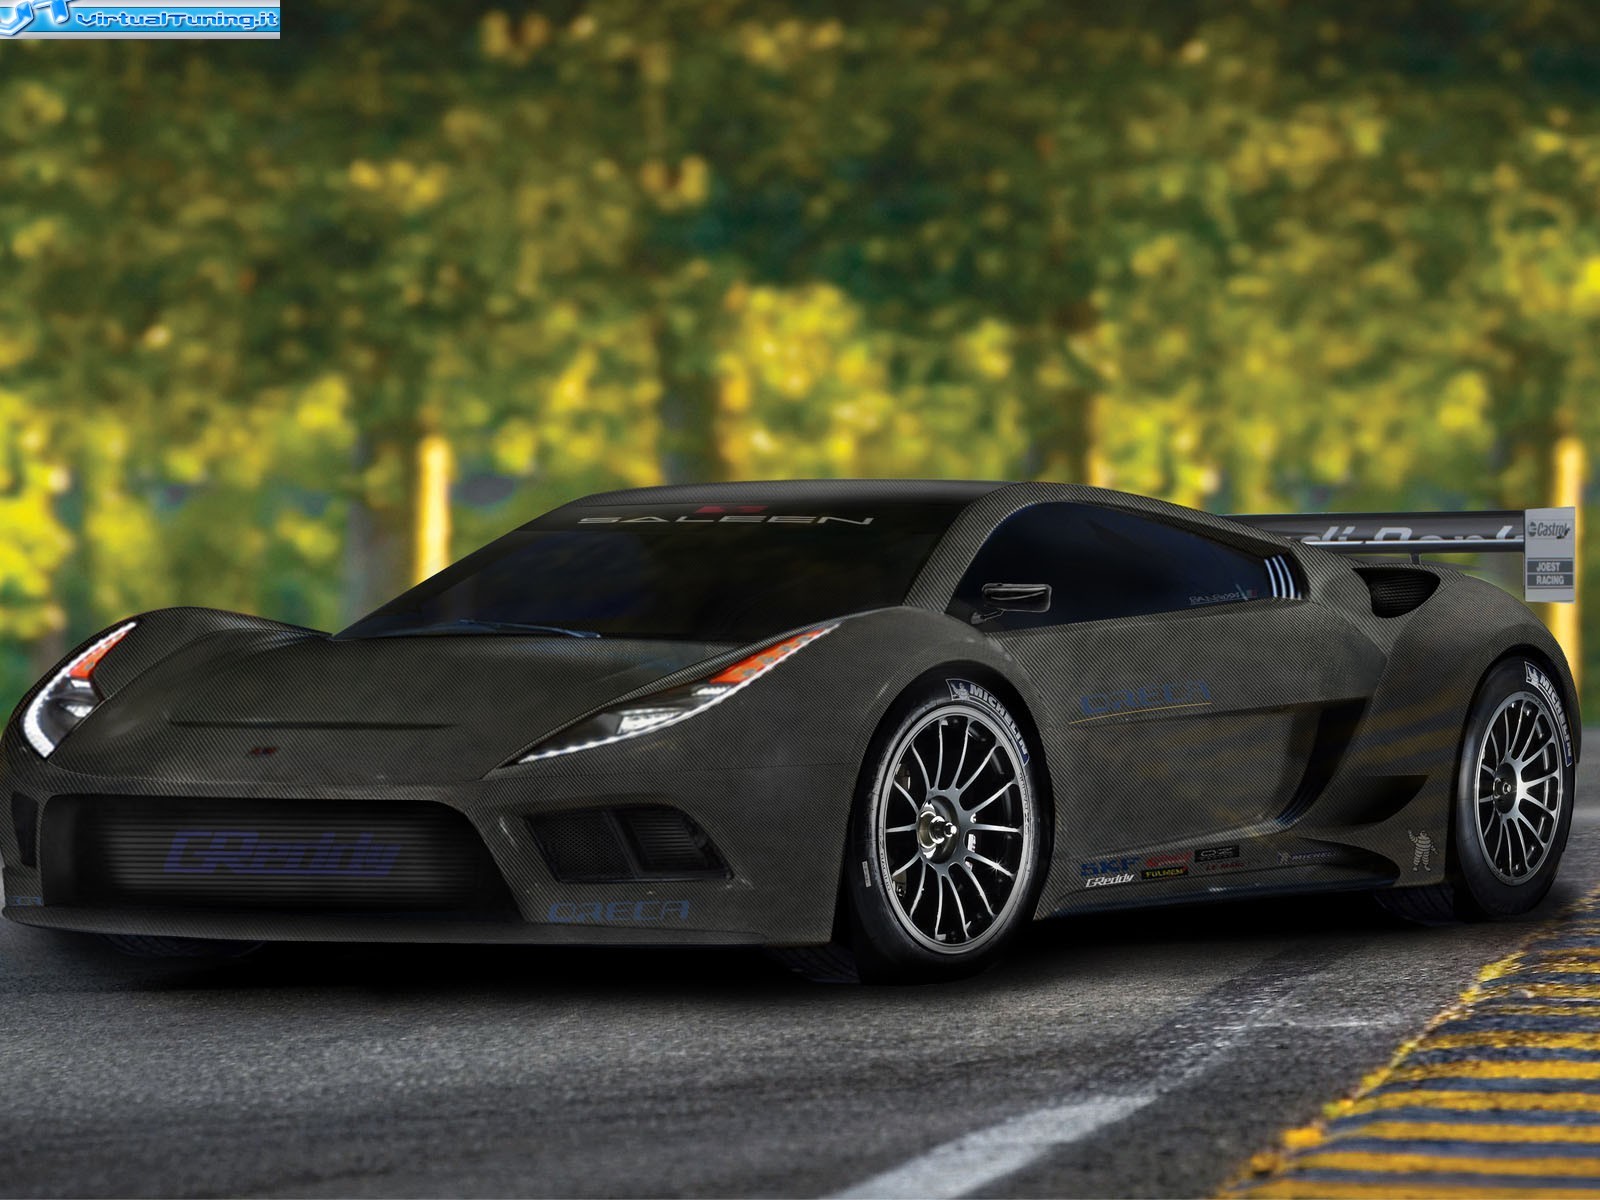 Saleen S5s Raptor By Badboy94 Virtualtuning It